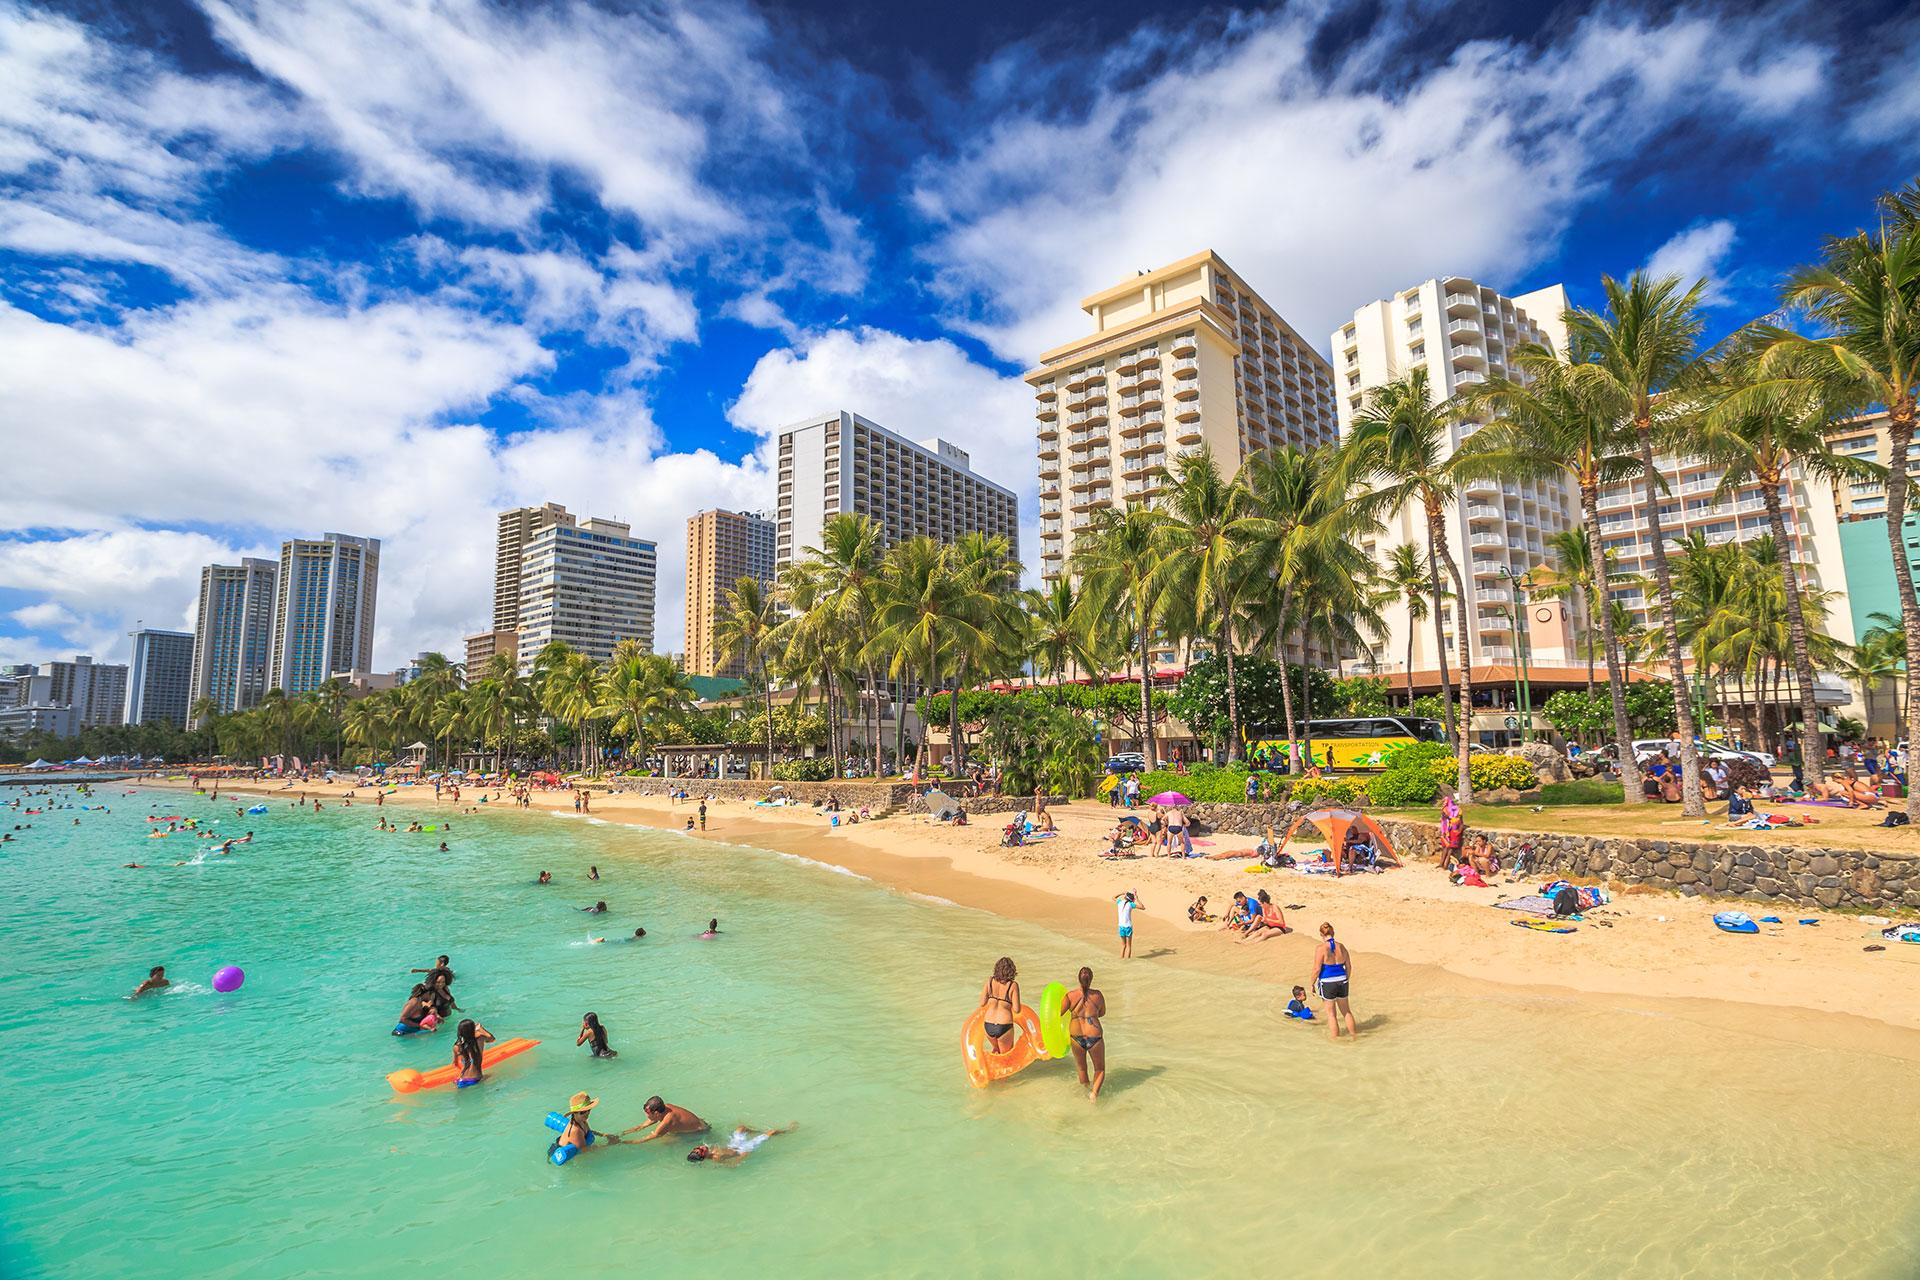 Waikiki Beach in Oahu, Hawaii; Courtesy of Benny Marty/Shutterstock.com